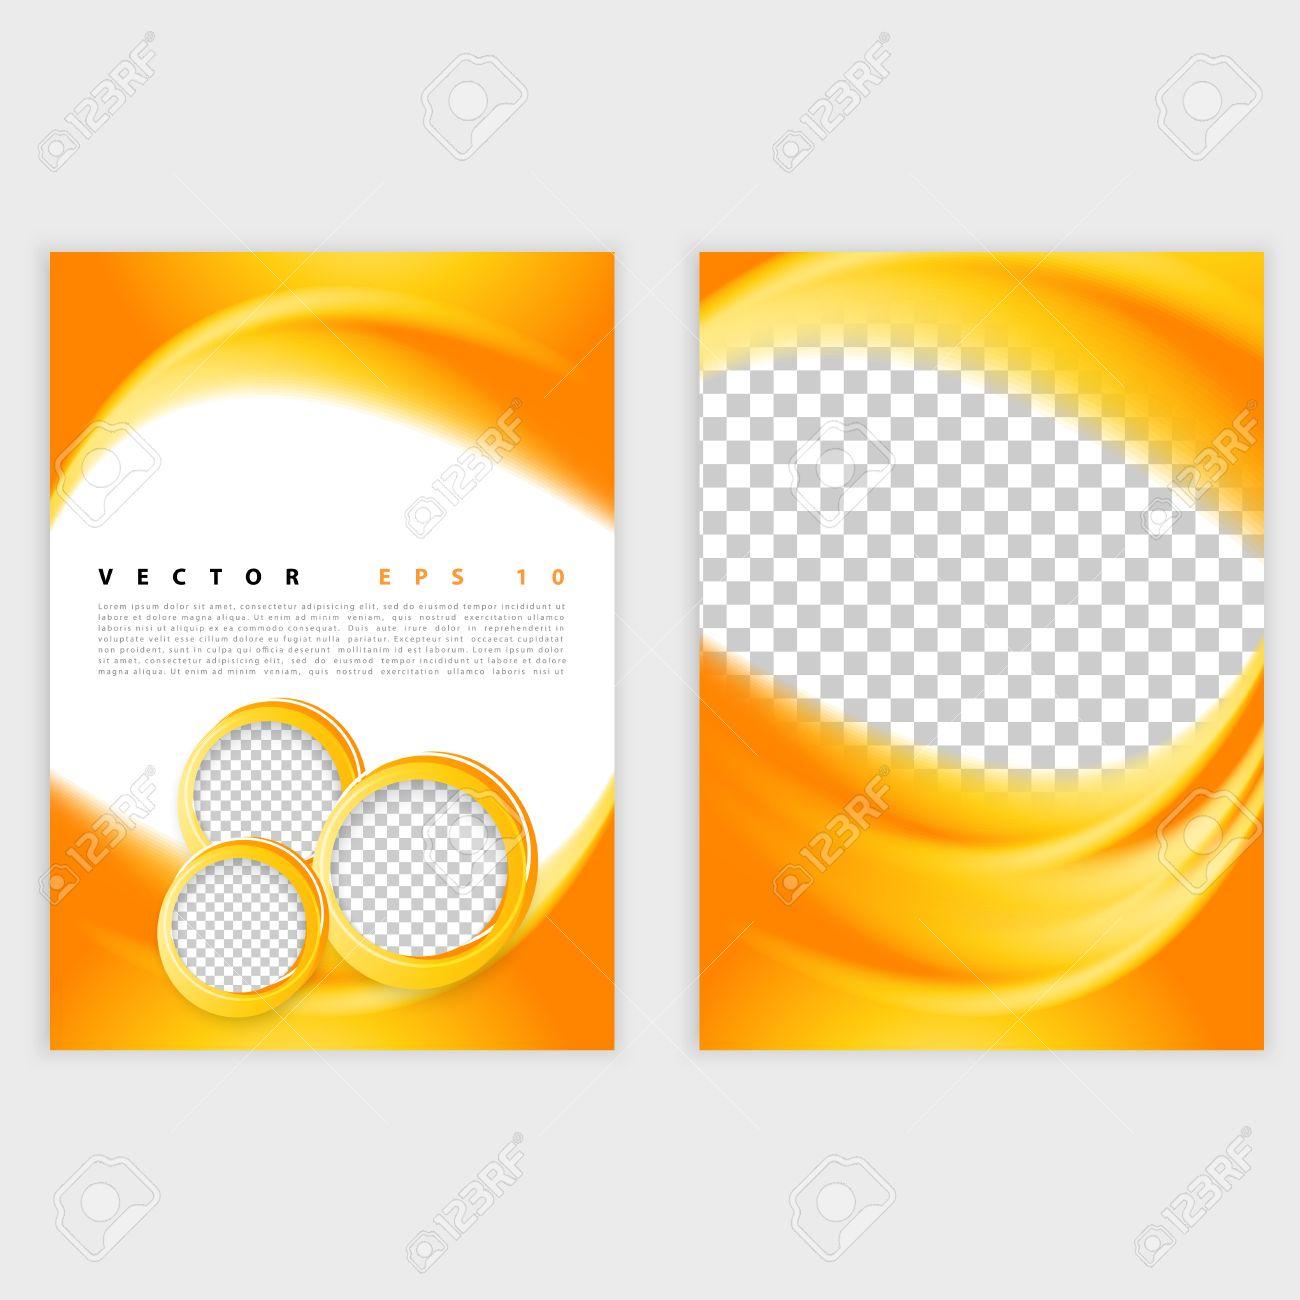 background design templates